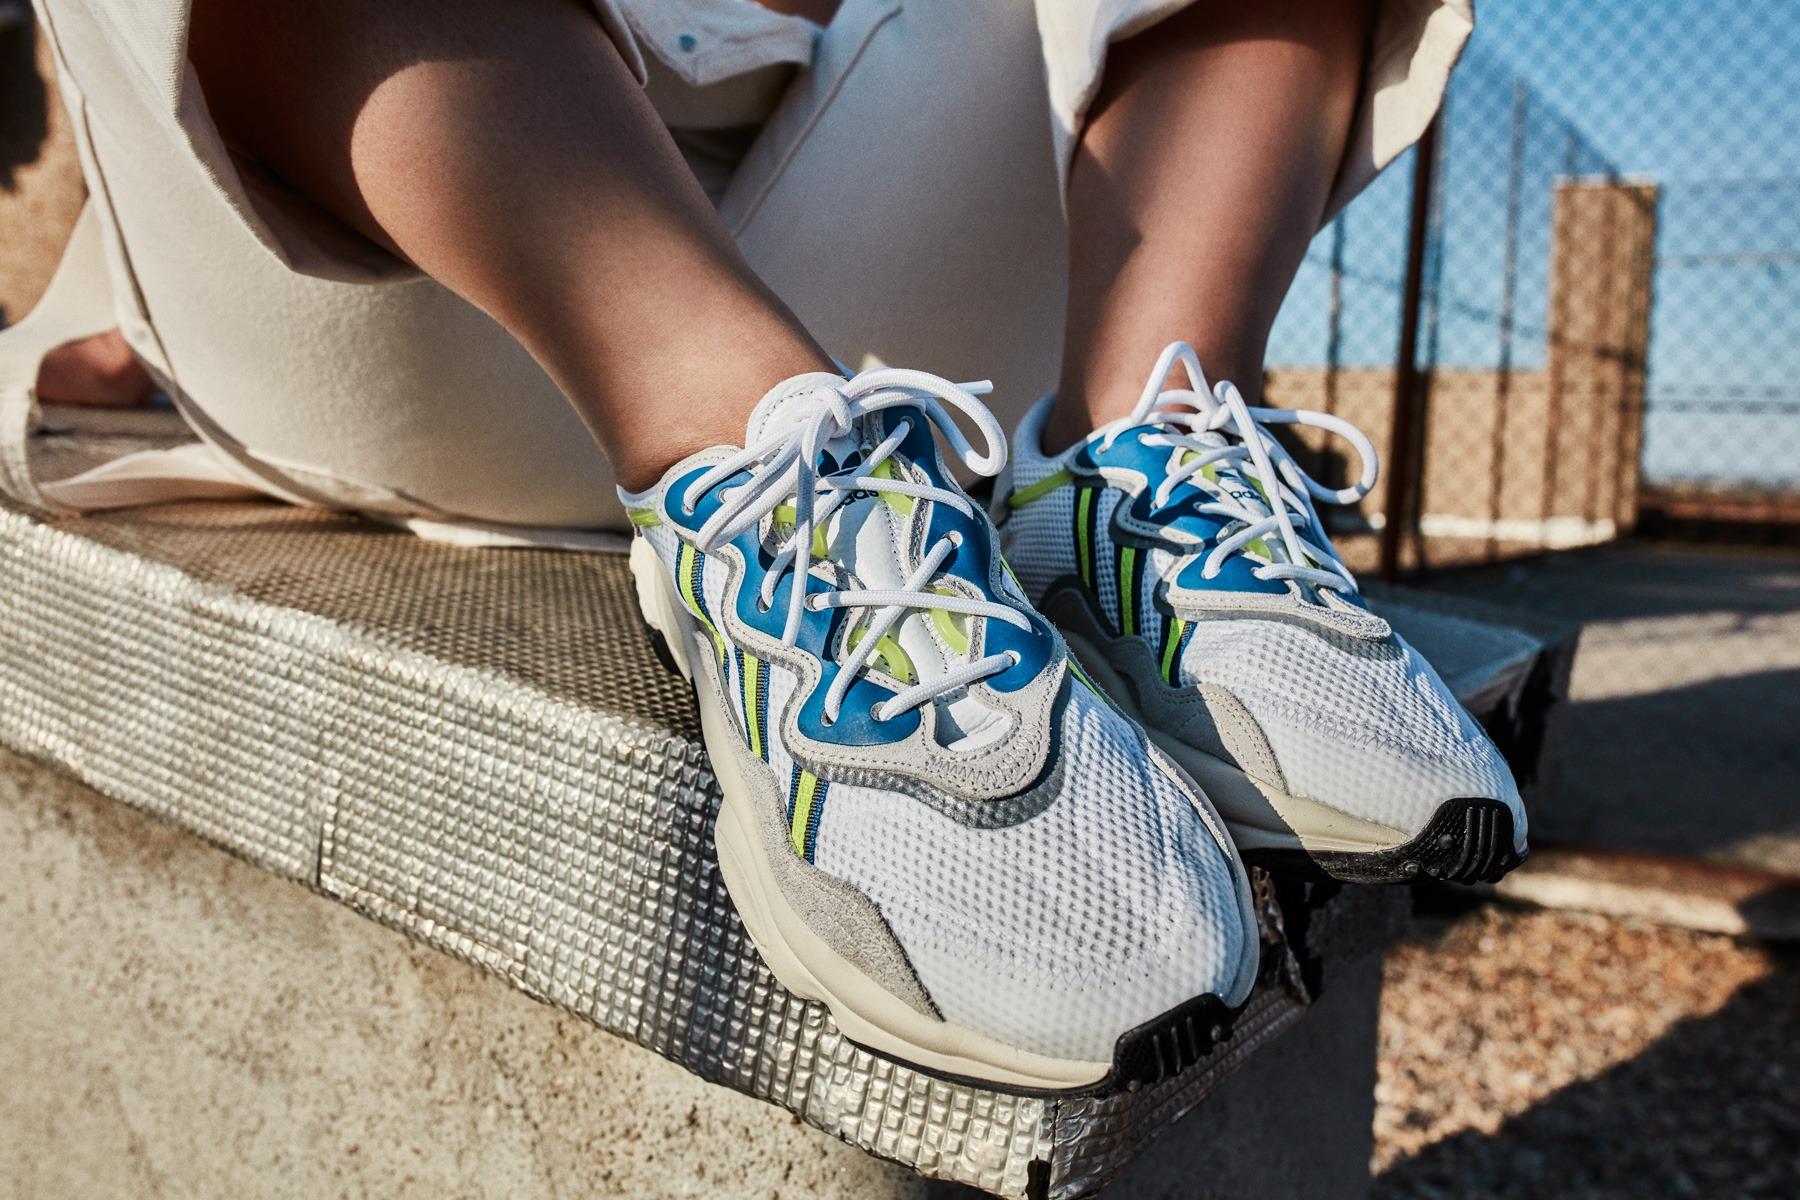 Adidas - Nathy Peluso-0929